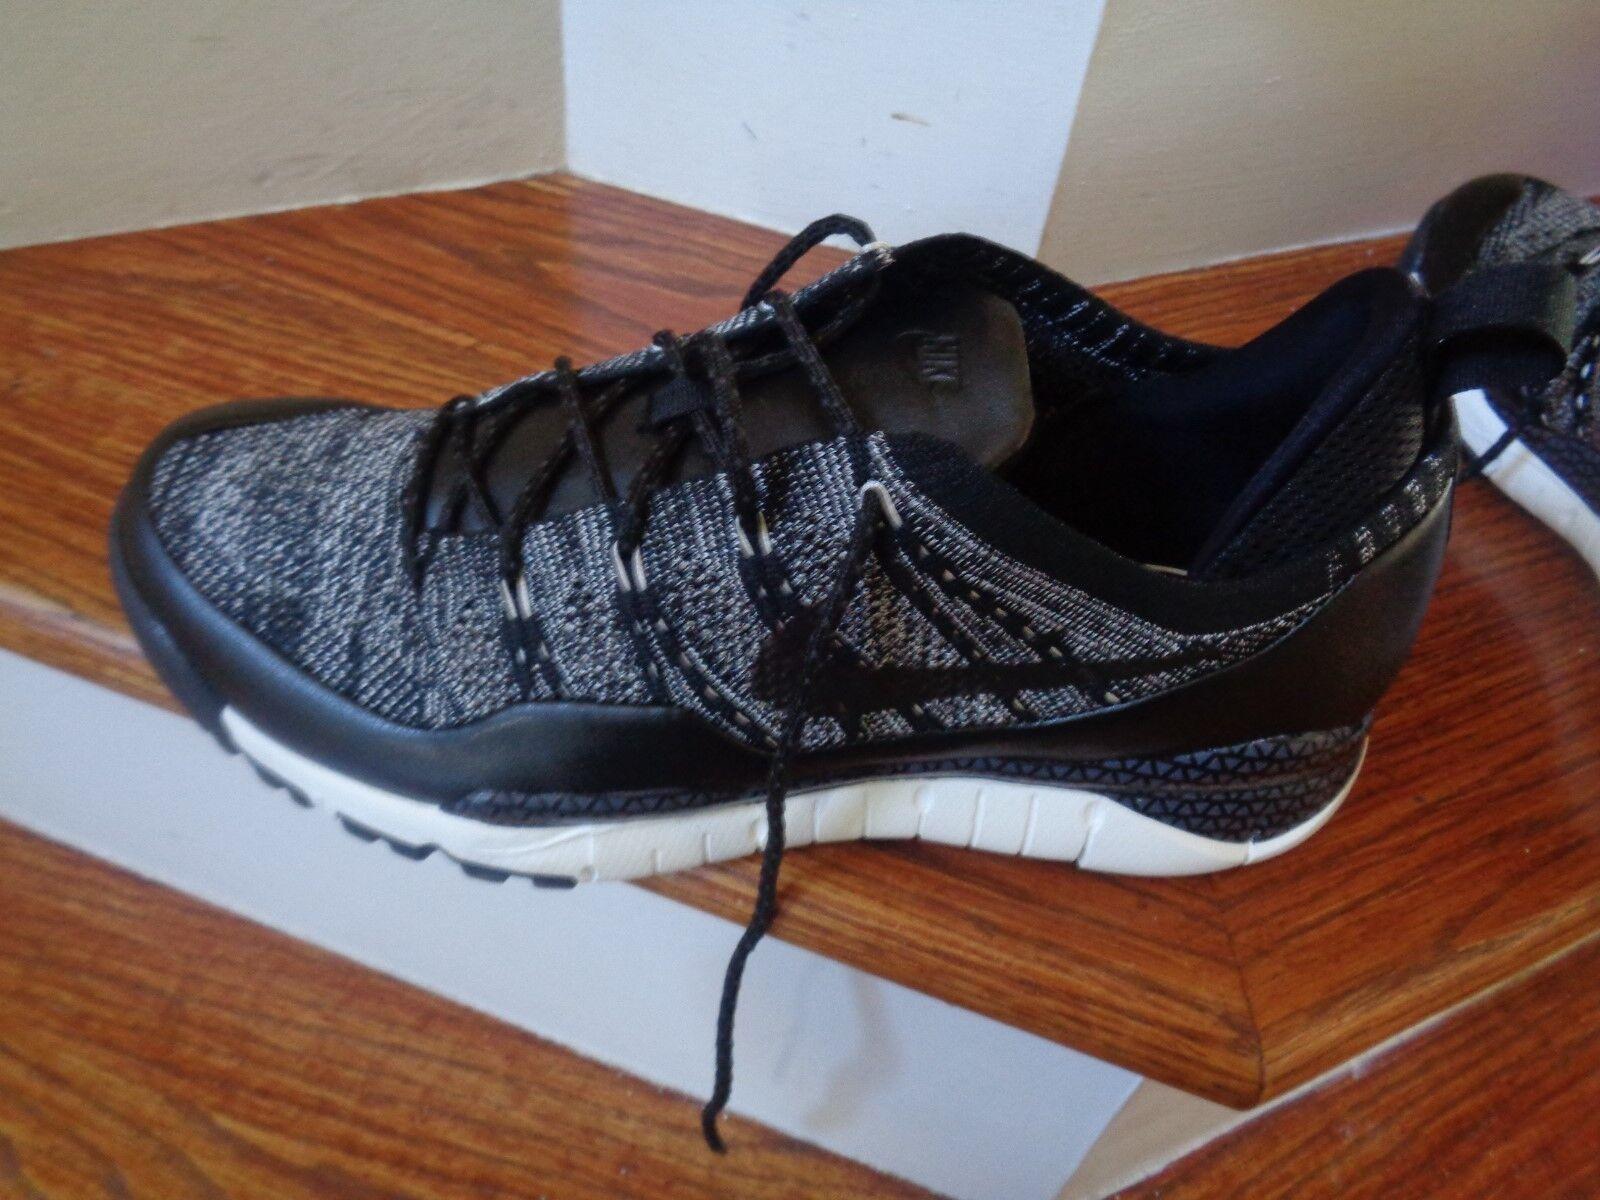 b3b80c9cd Nike Lupinek Lupinek Lupinek Flyknit Men s Basketball Shoes